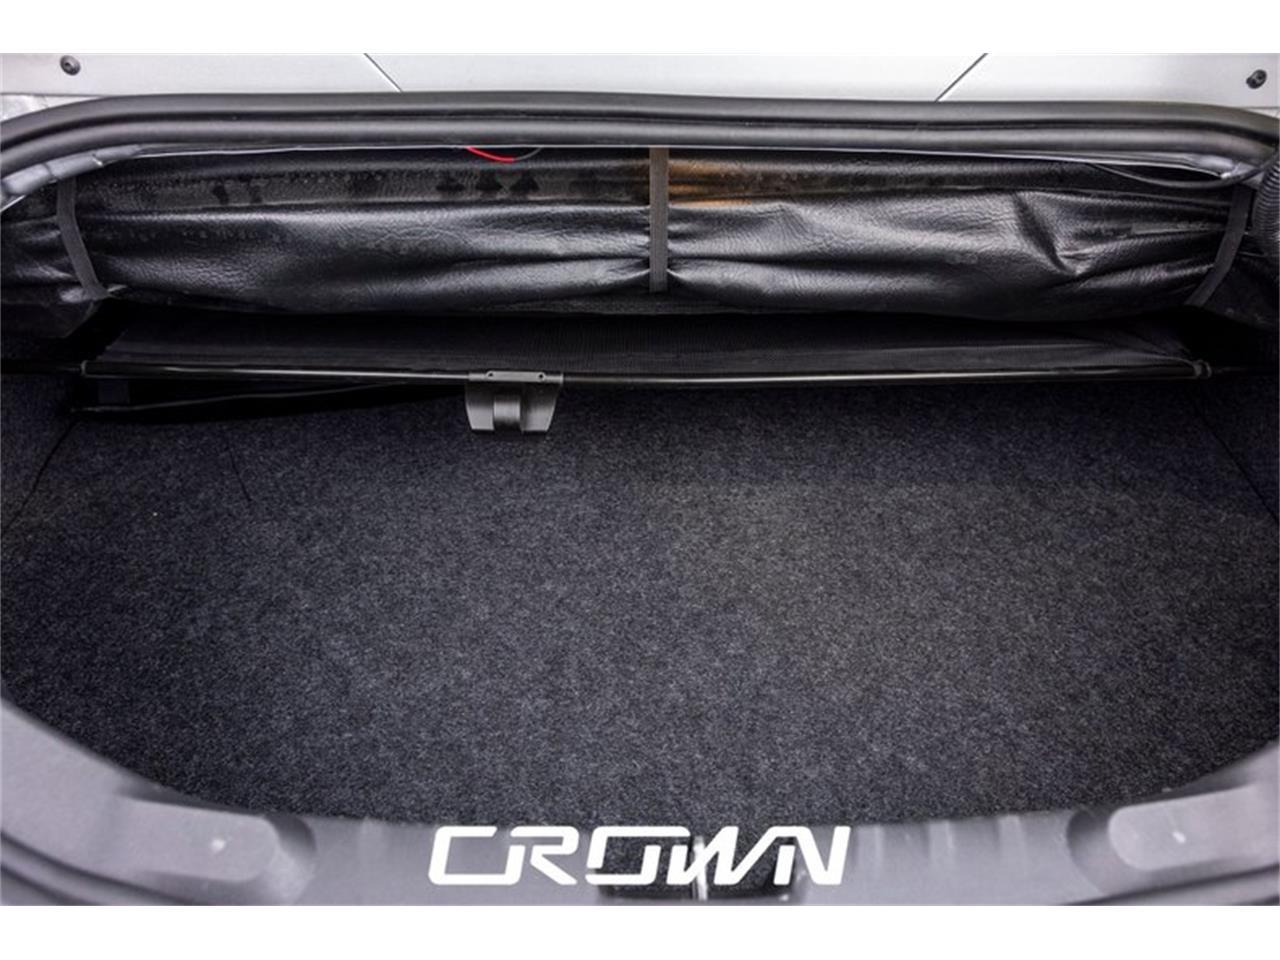 2013 Chevrolet Camaro (CC-1334238) for sale in Tucson, Arizona